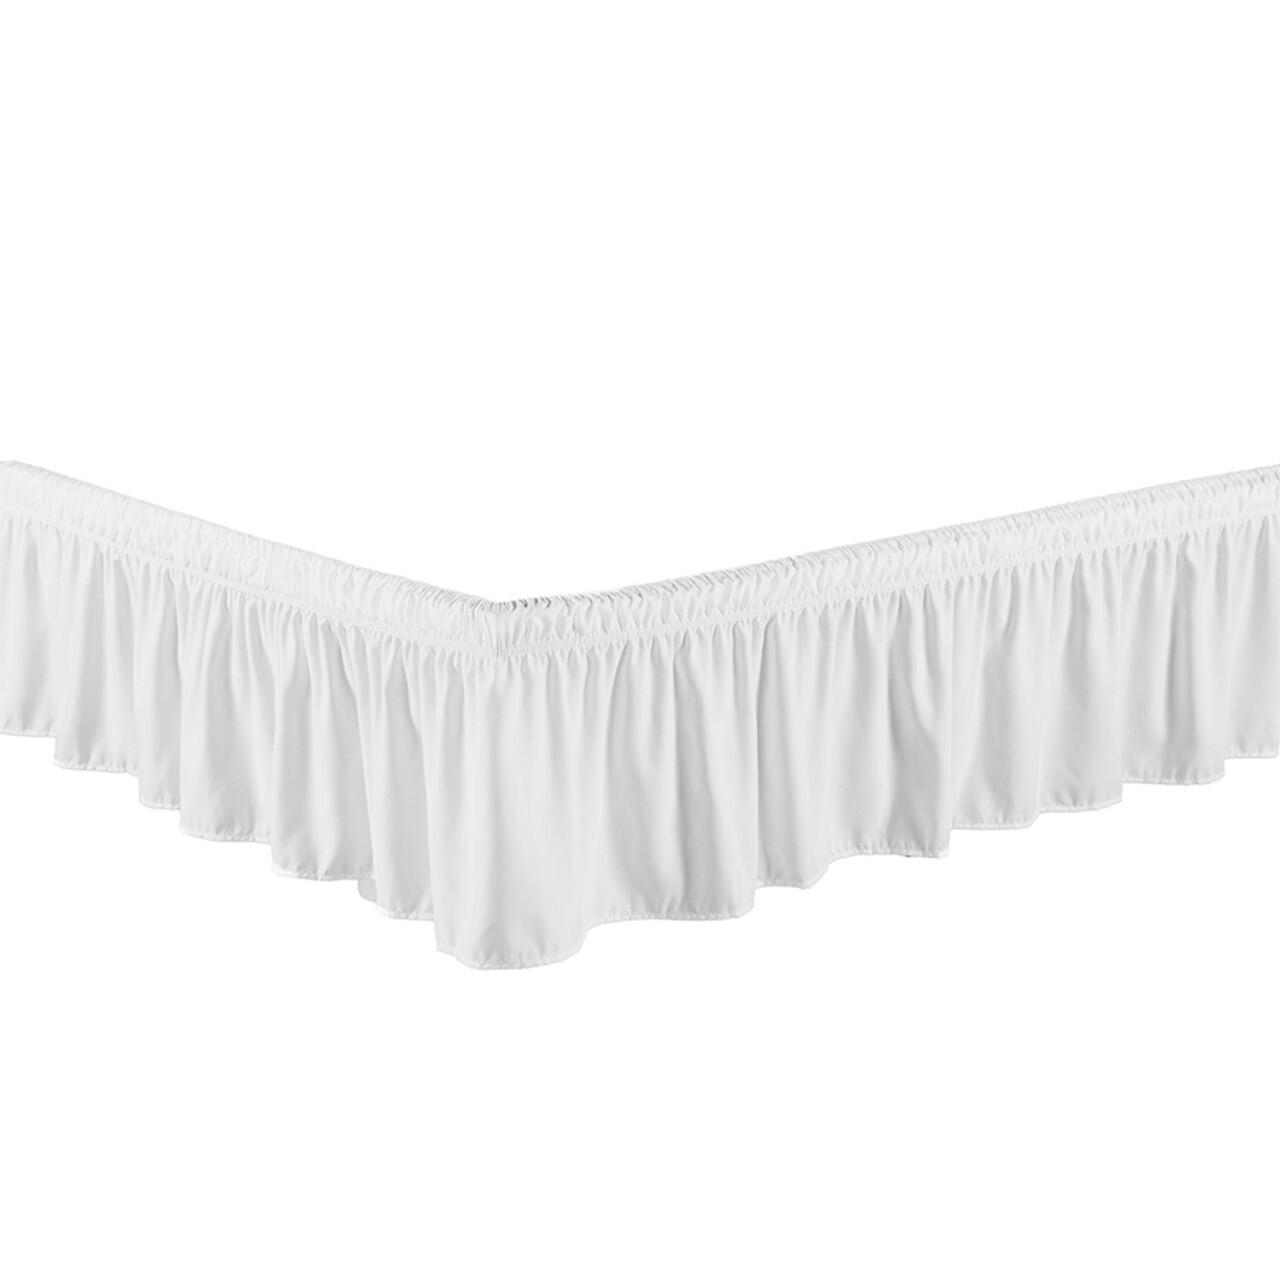 "White Bed Skirt Dust Ruffle 100% Brushed Microfiber with 14"" Drop in USA, California, New York, New York City, Los Angeles, San Francisco, Pennsylvania, Washington DC, Virginia, Maryland"